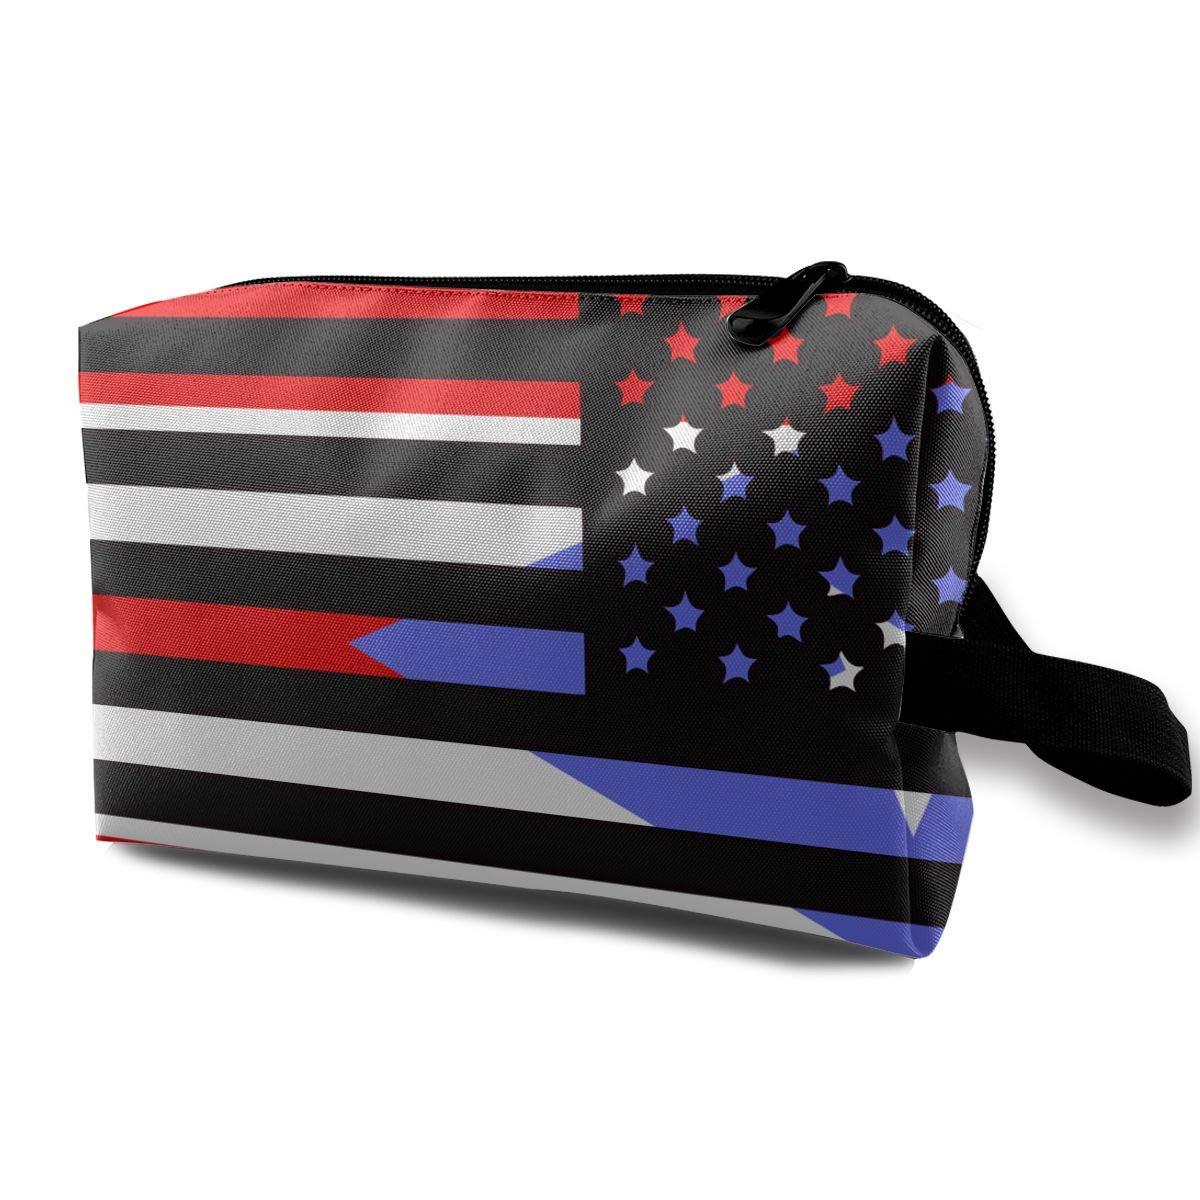 20c2af49fded Amazon.com: Puerto Rico American Flag-1 Men Women Toiletry Bag ...